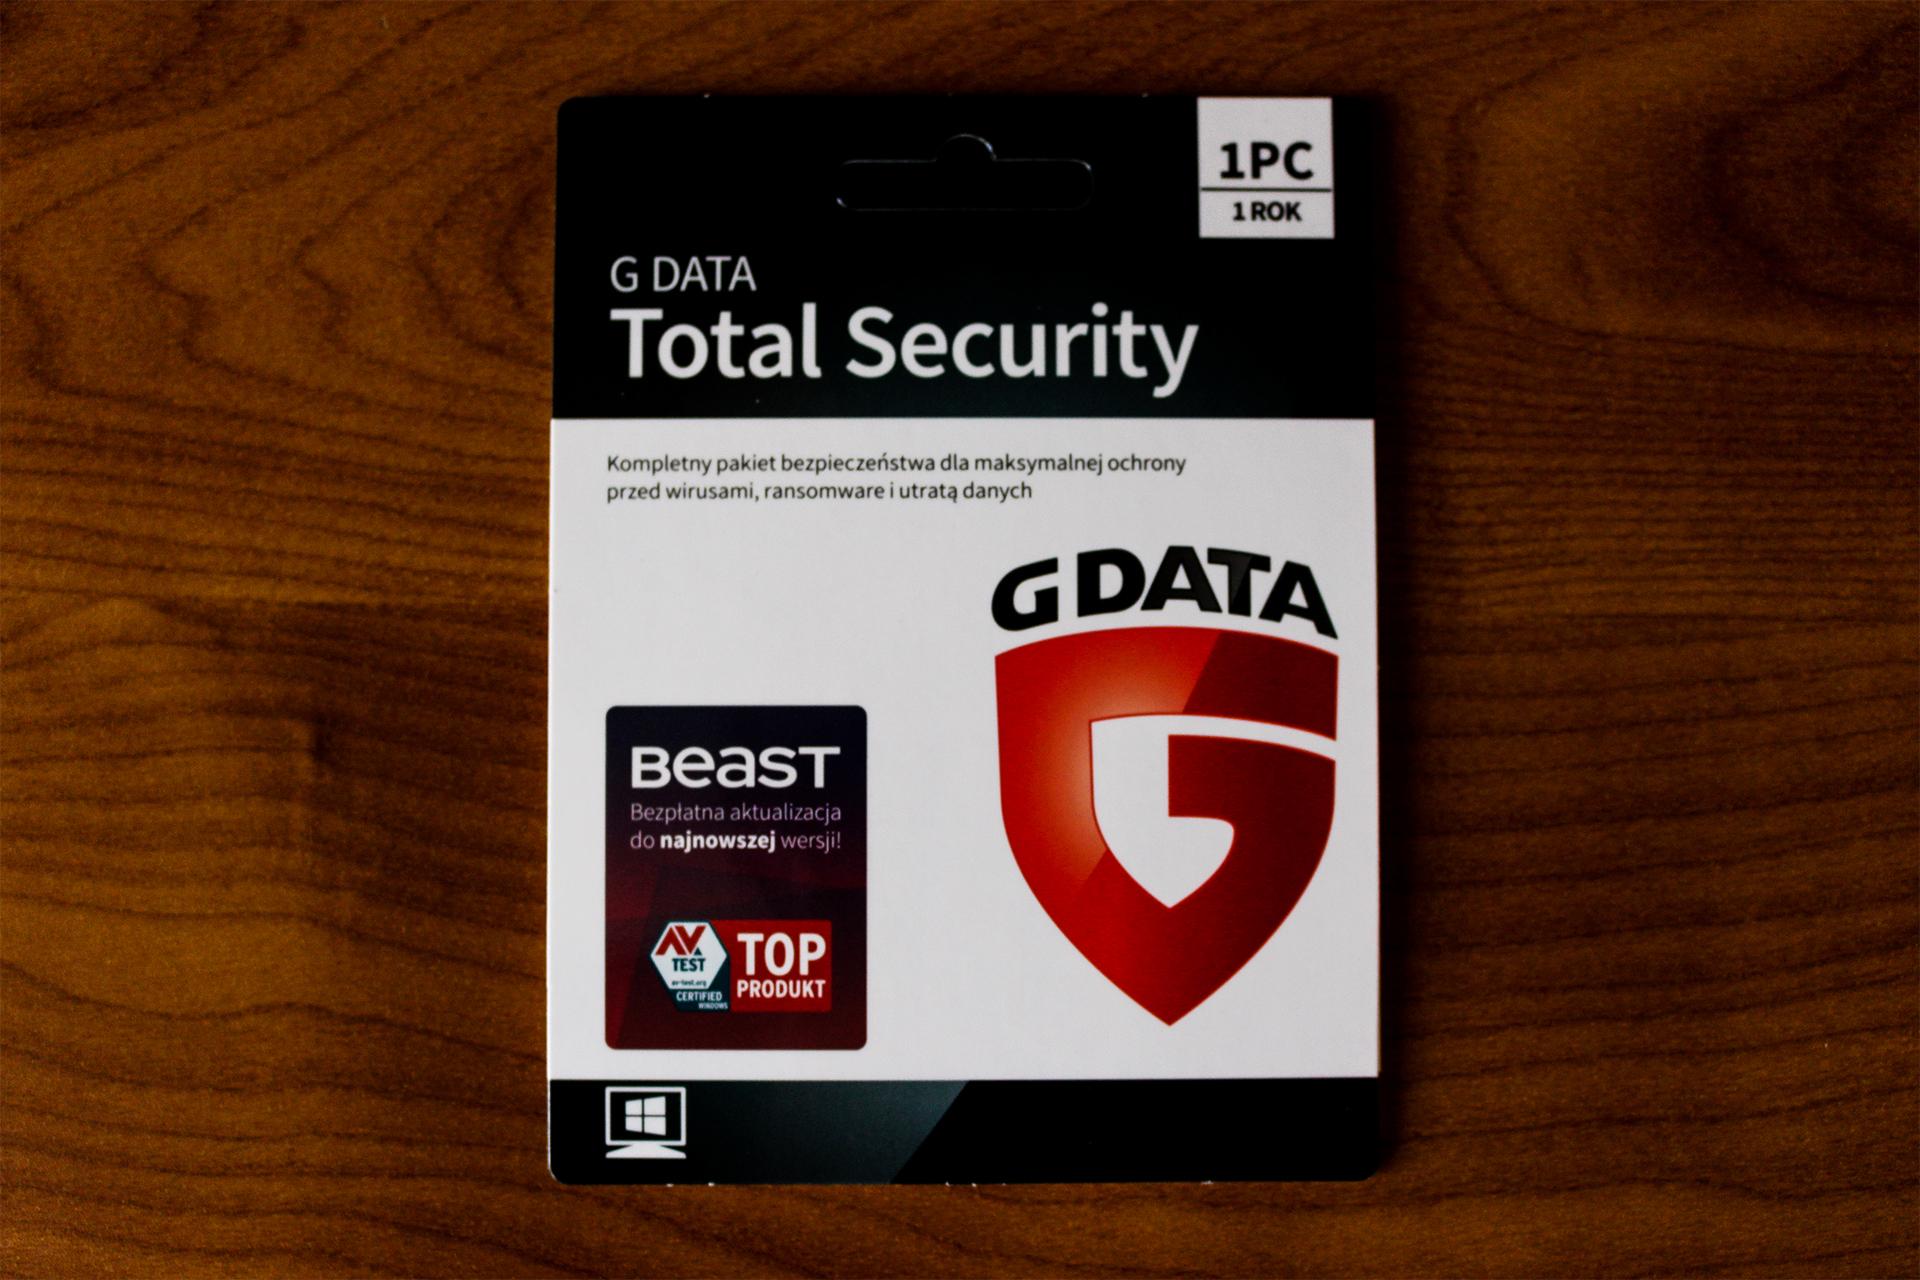 G DATA TOTAL SECURITY 1PC 1 ROK KARTA KLUCZ